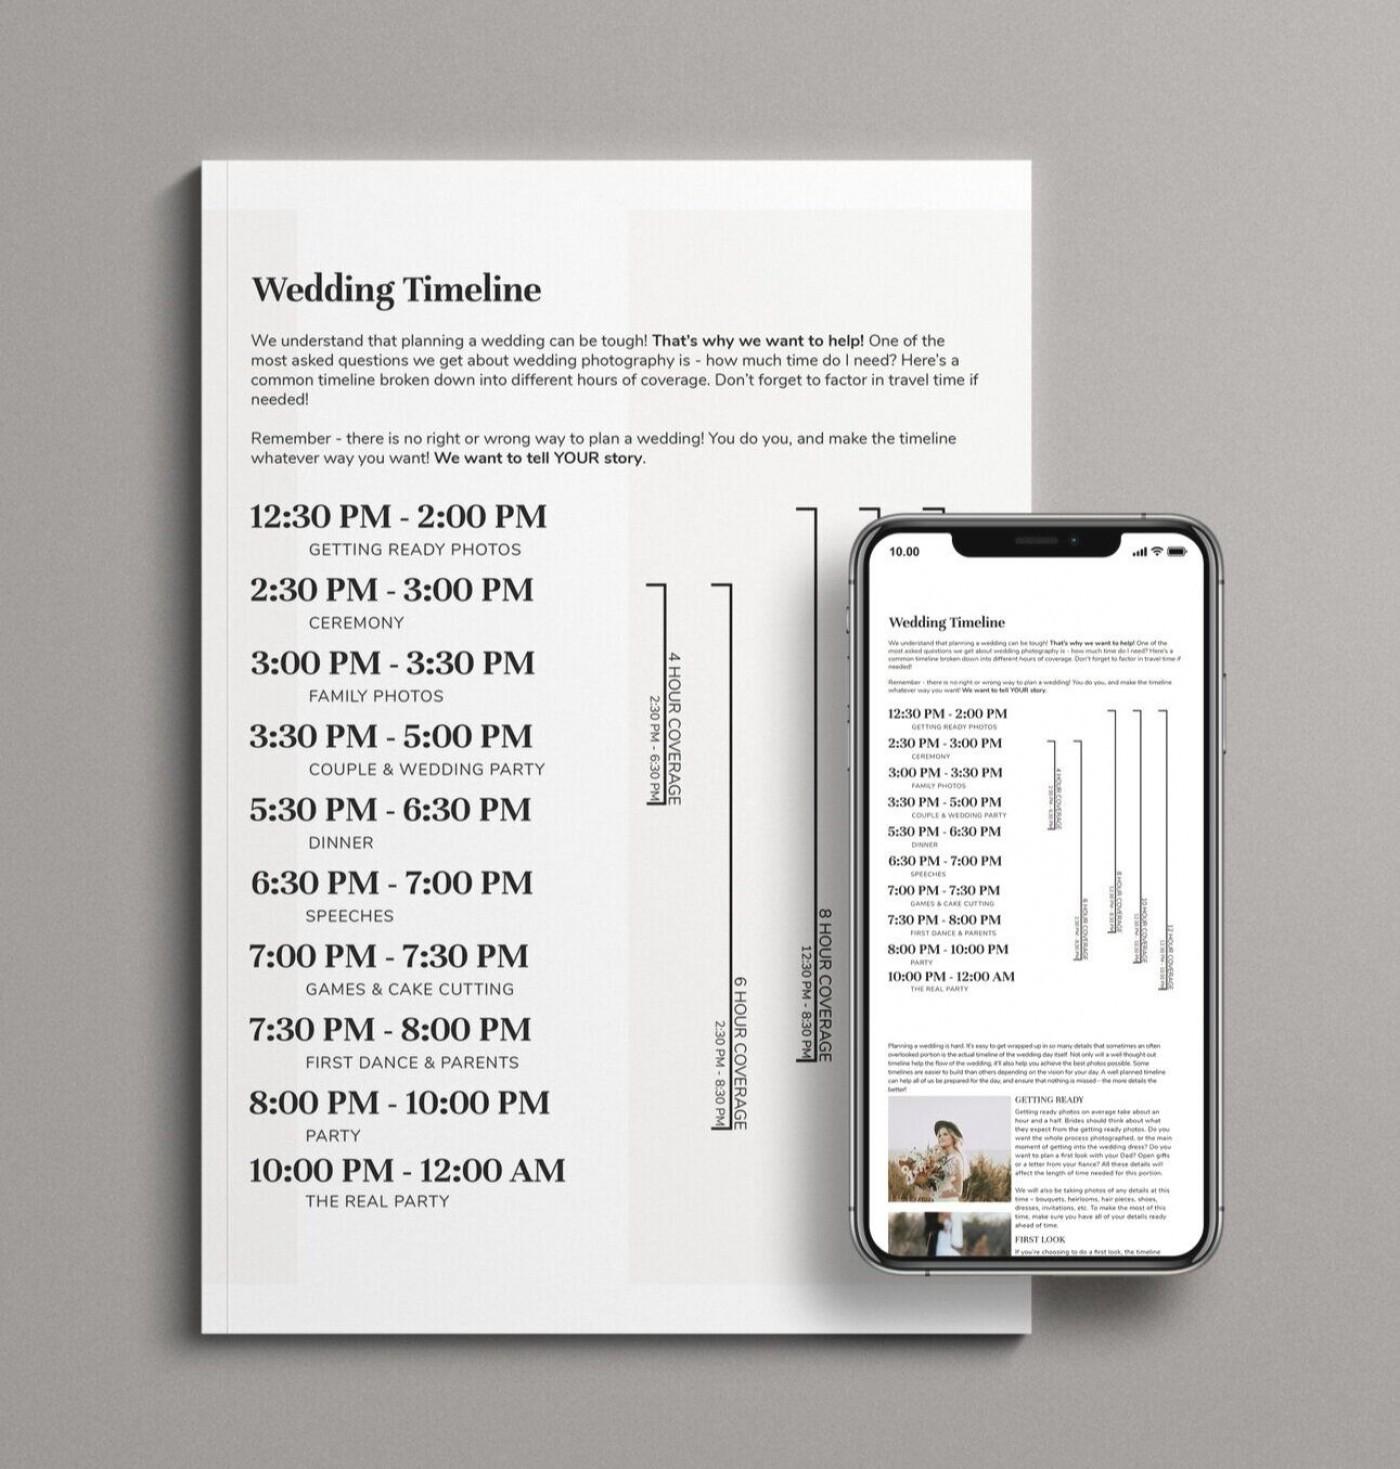 006 Singular Wedding Timeline Template Free Image  Day Excel Program1400